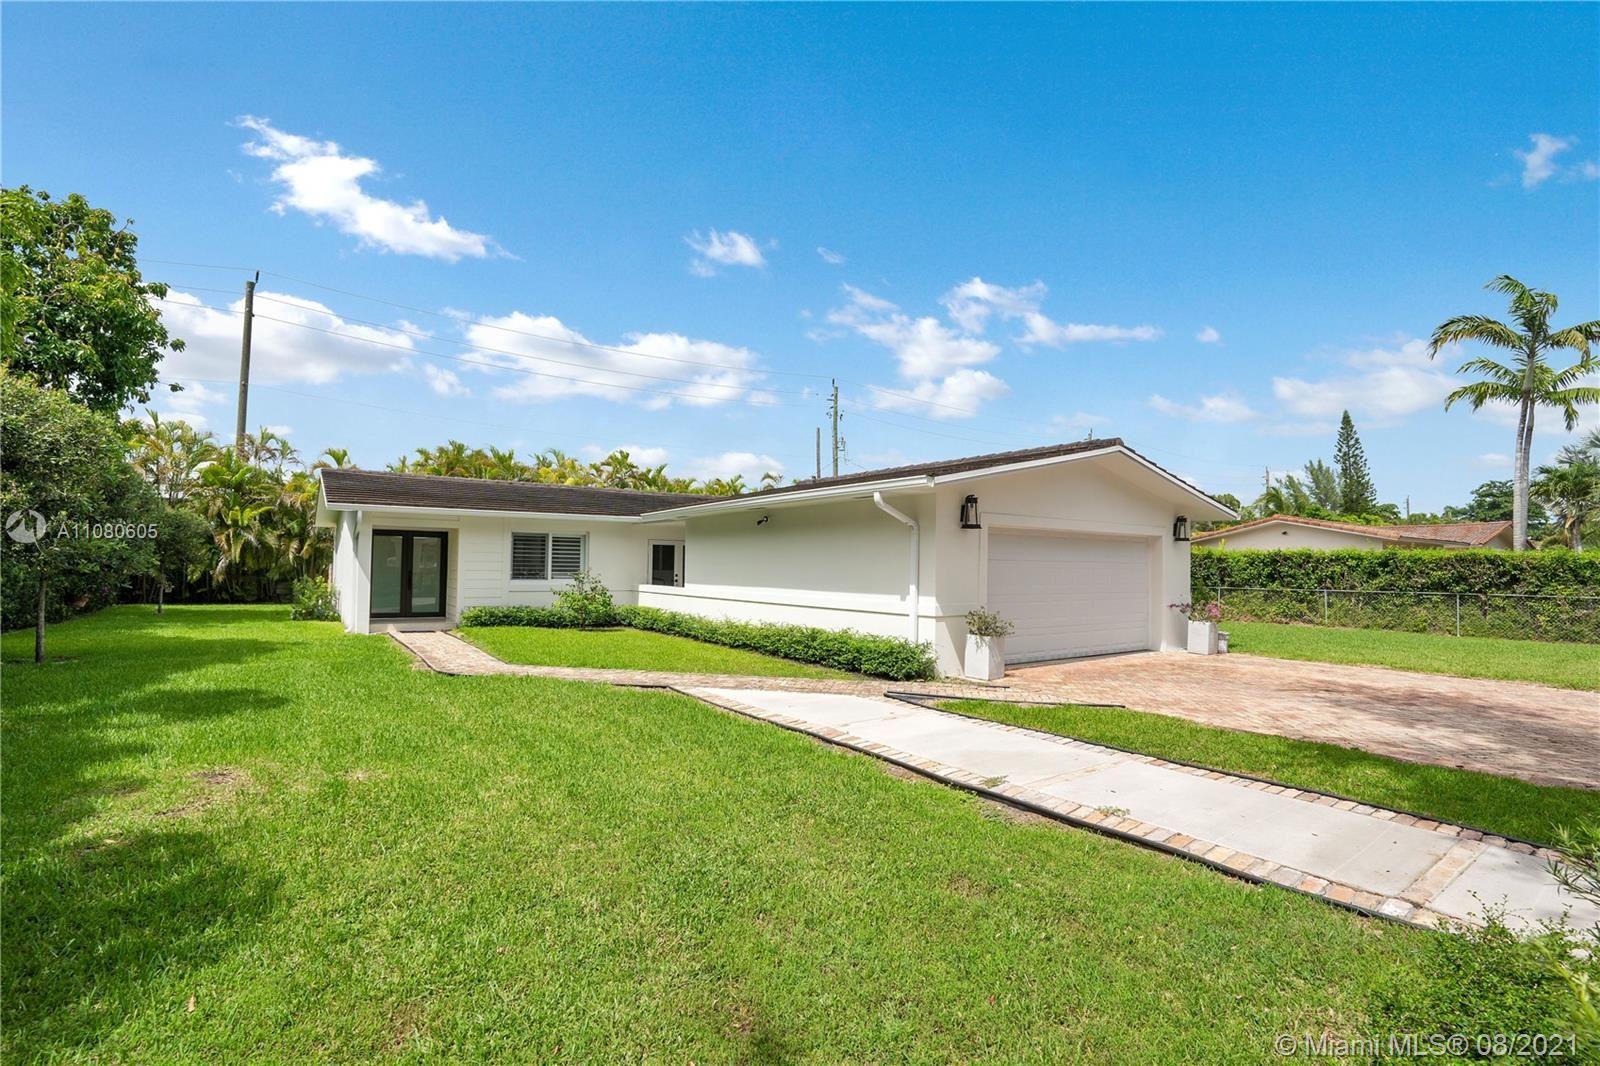 7111 SW 92nd St, Pinecrest, FL 33156 - #: A11080605